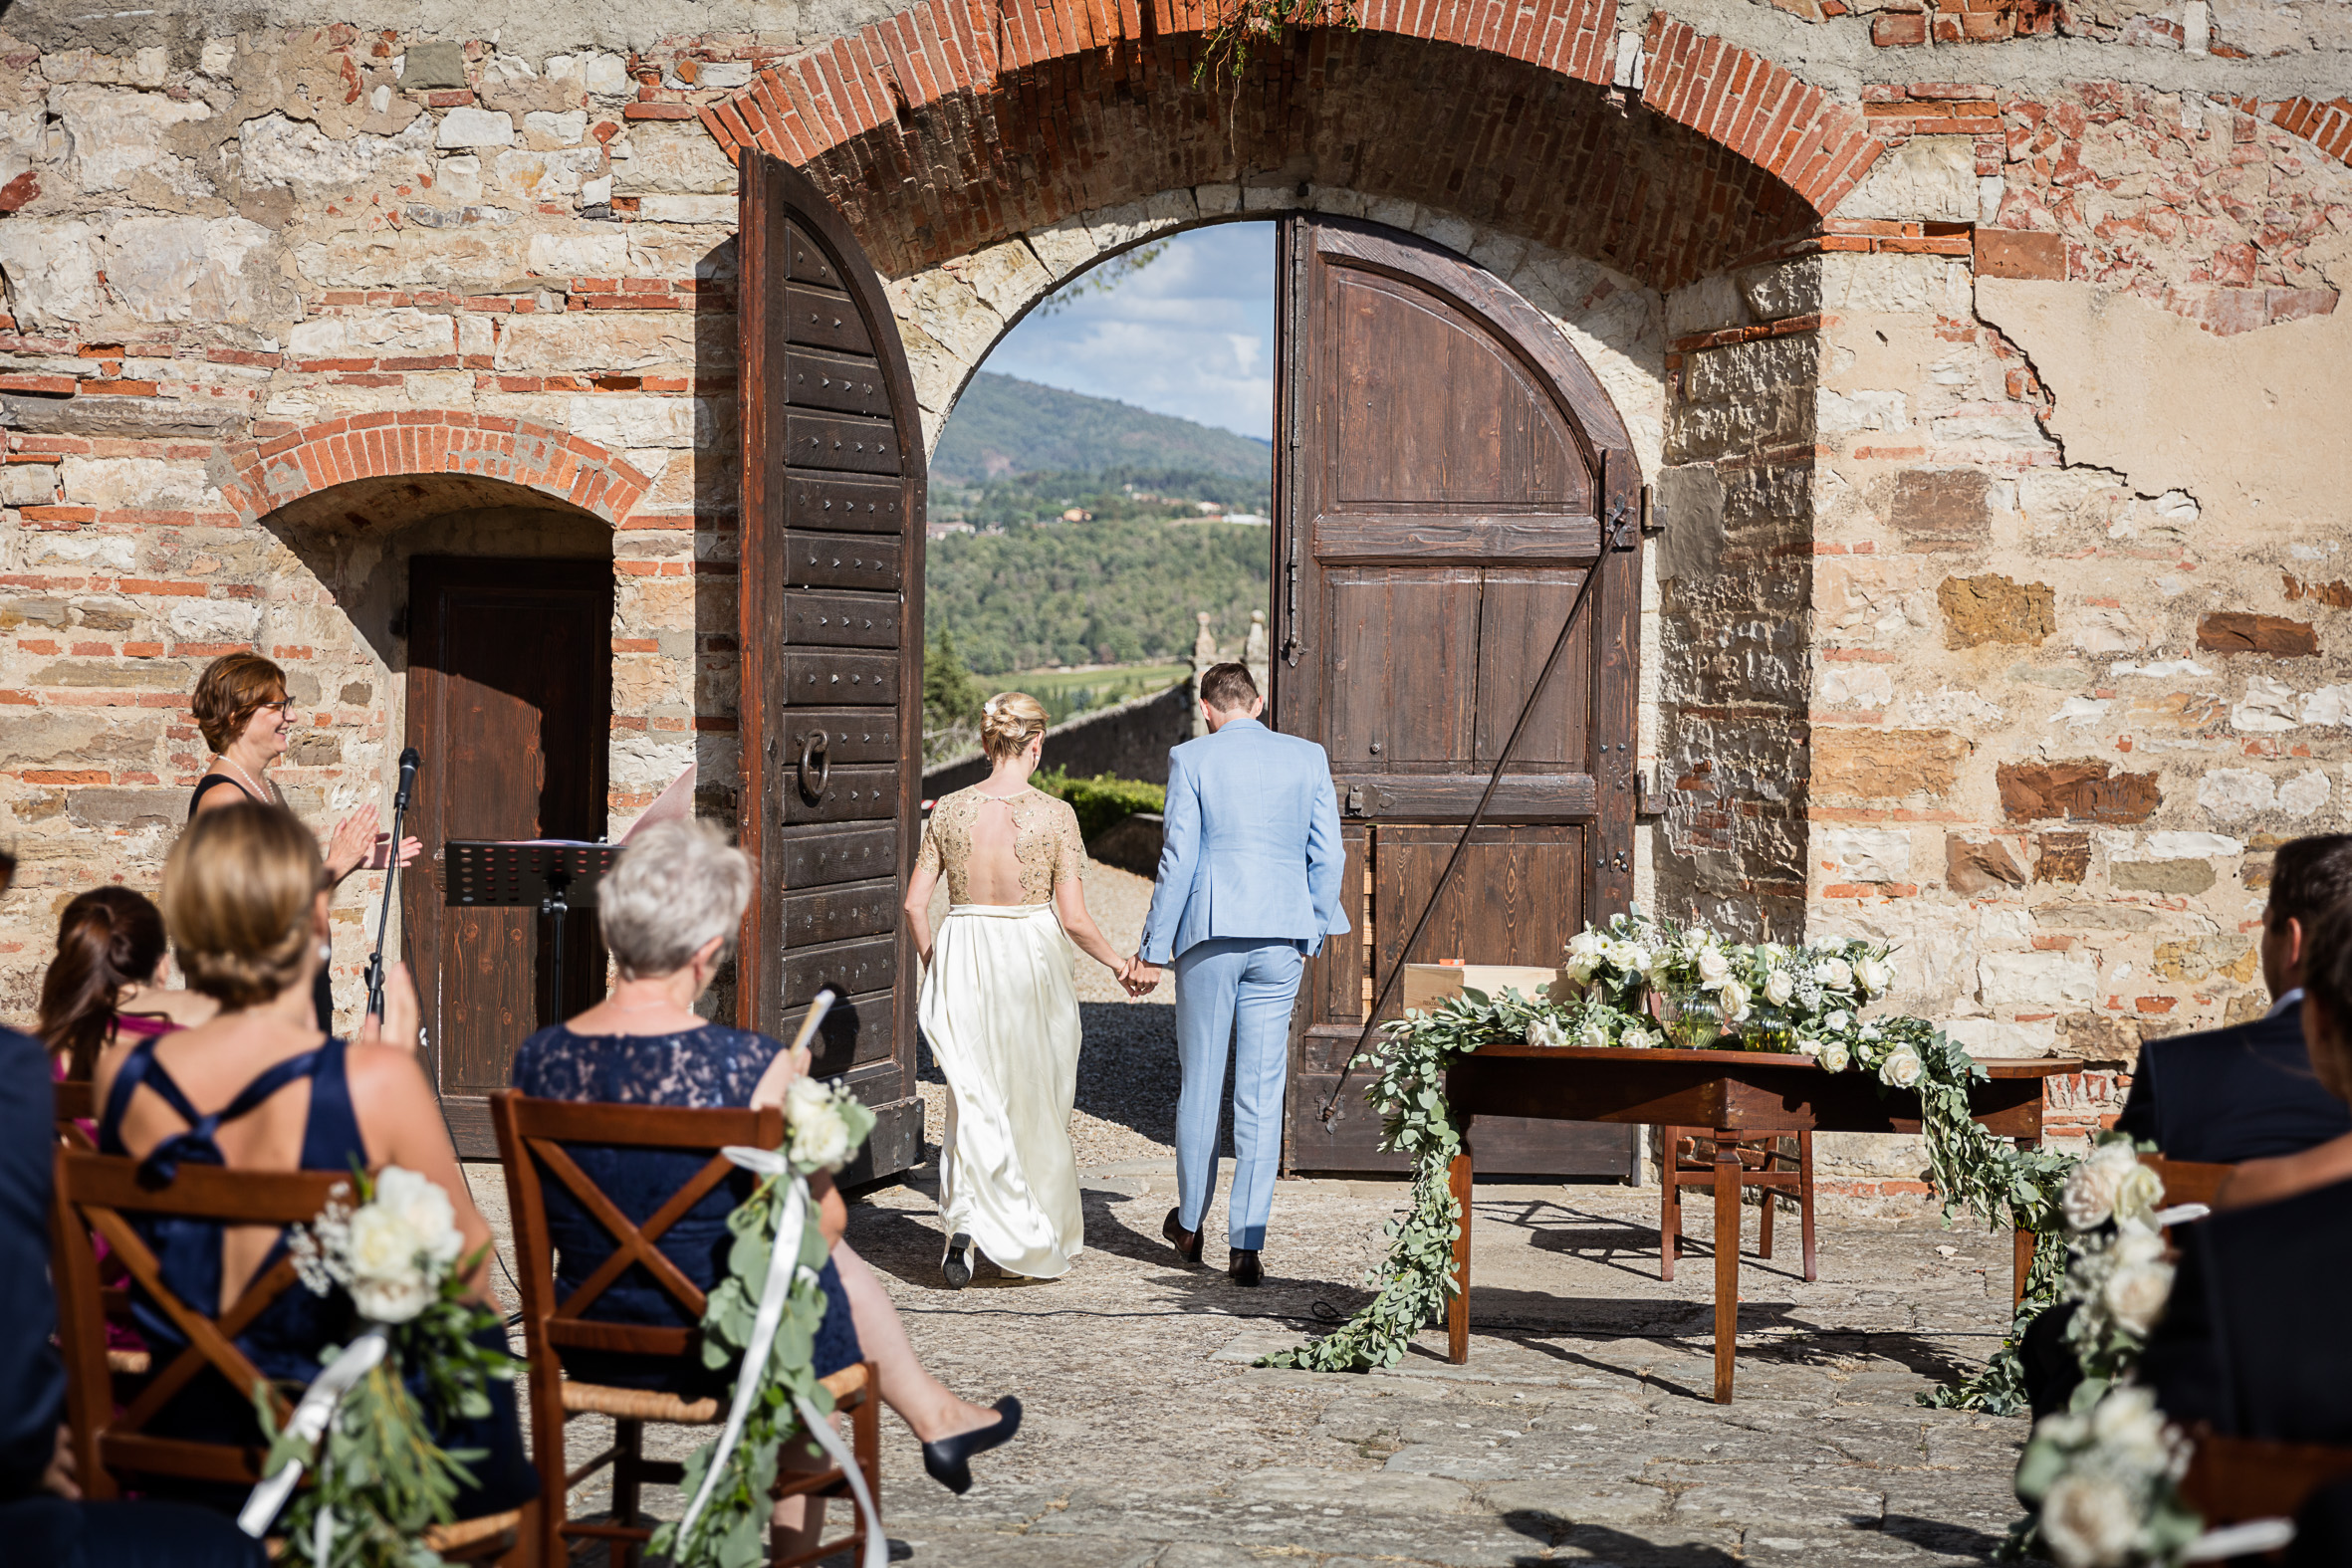 Hochzeit Andrea und Dario_Toskana 2017_103_a4.jpg